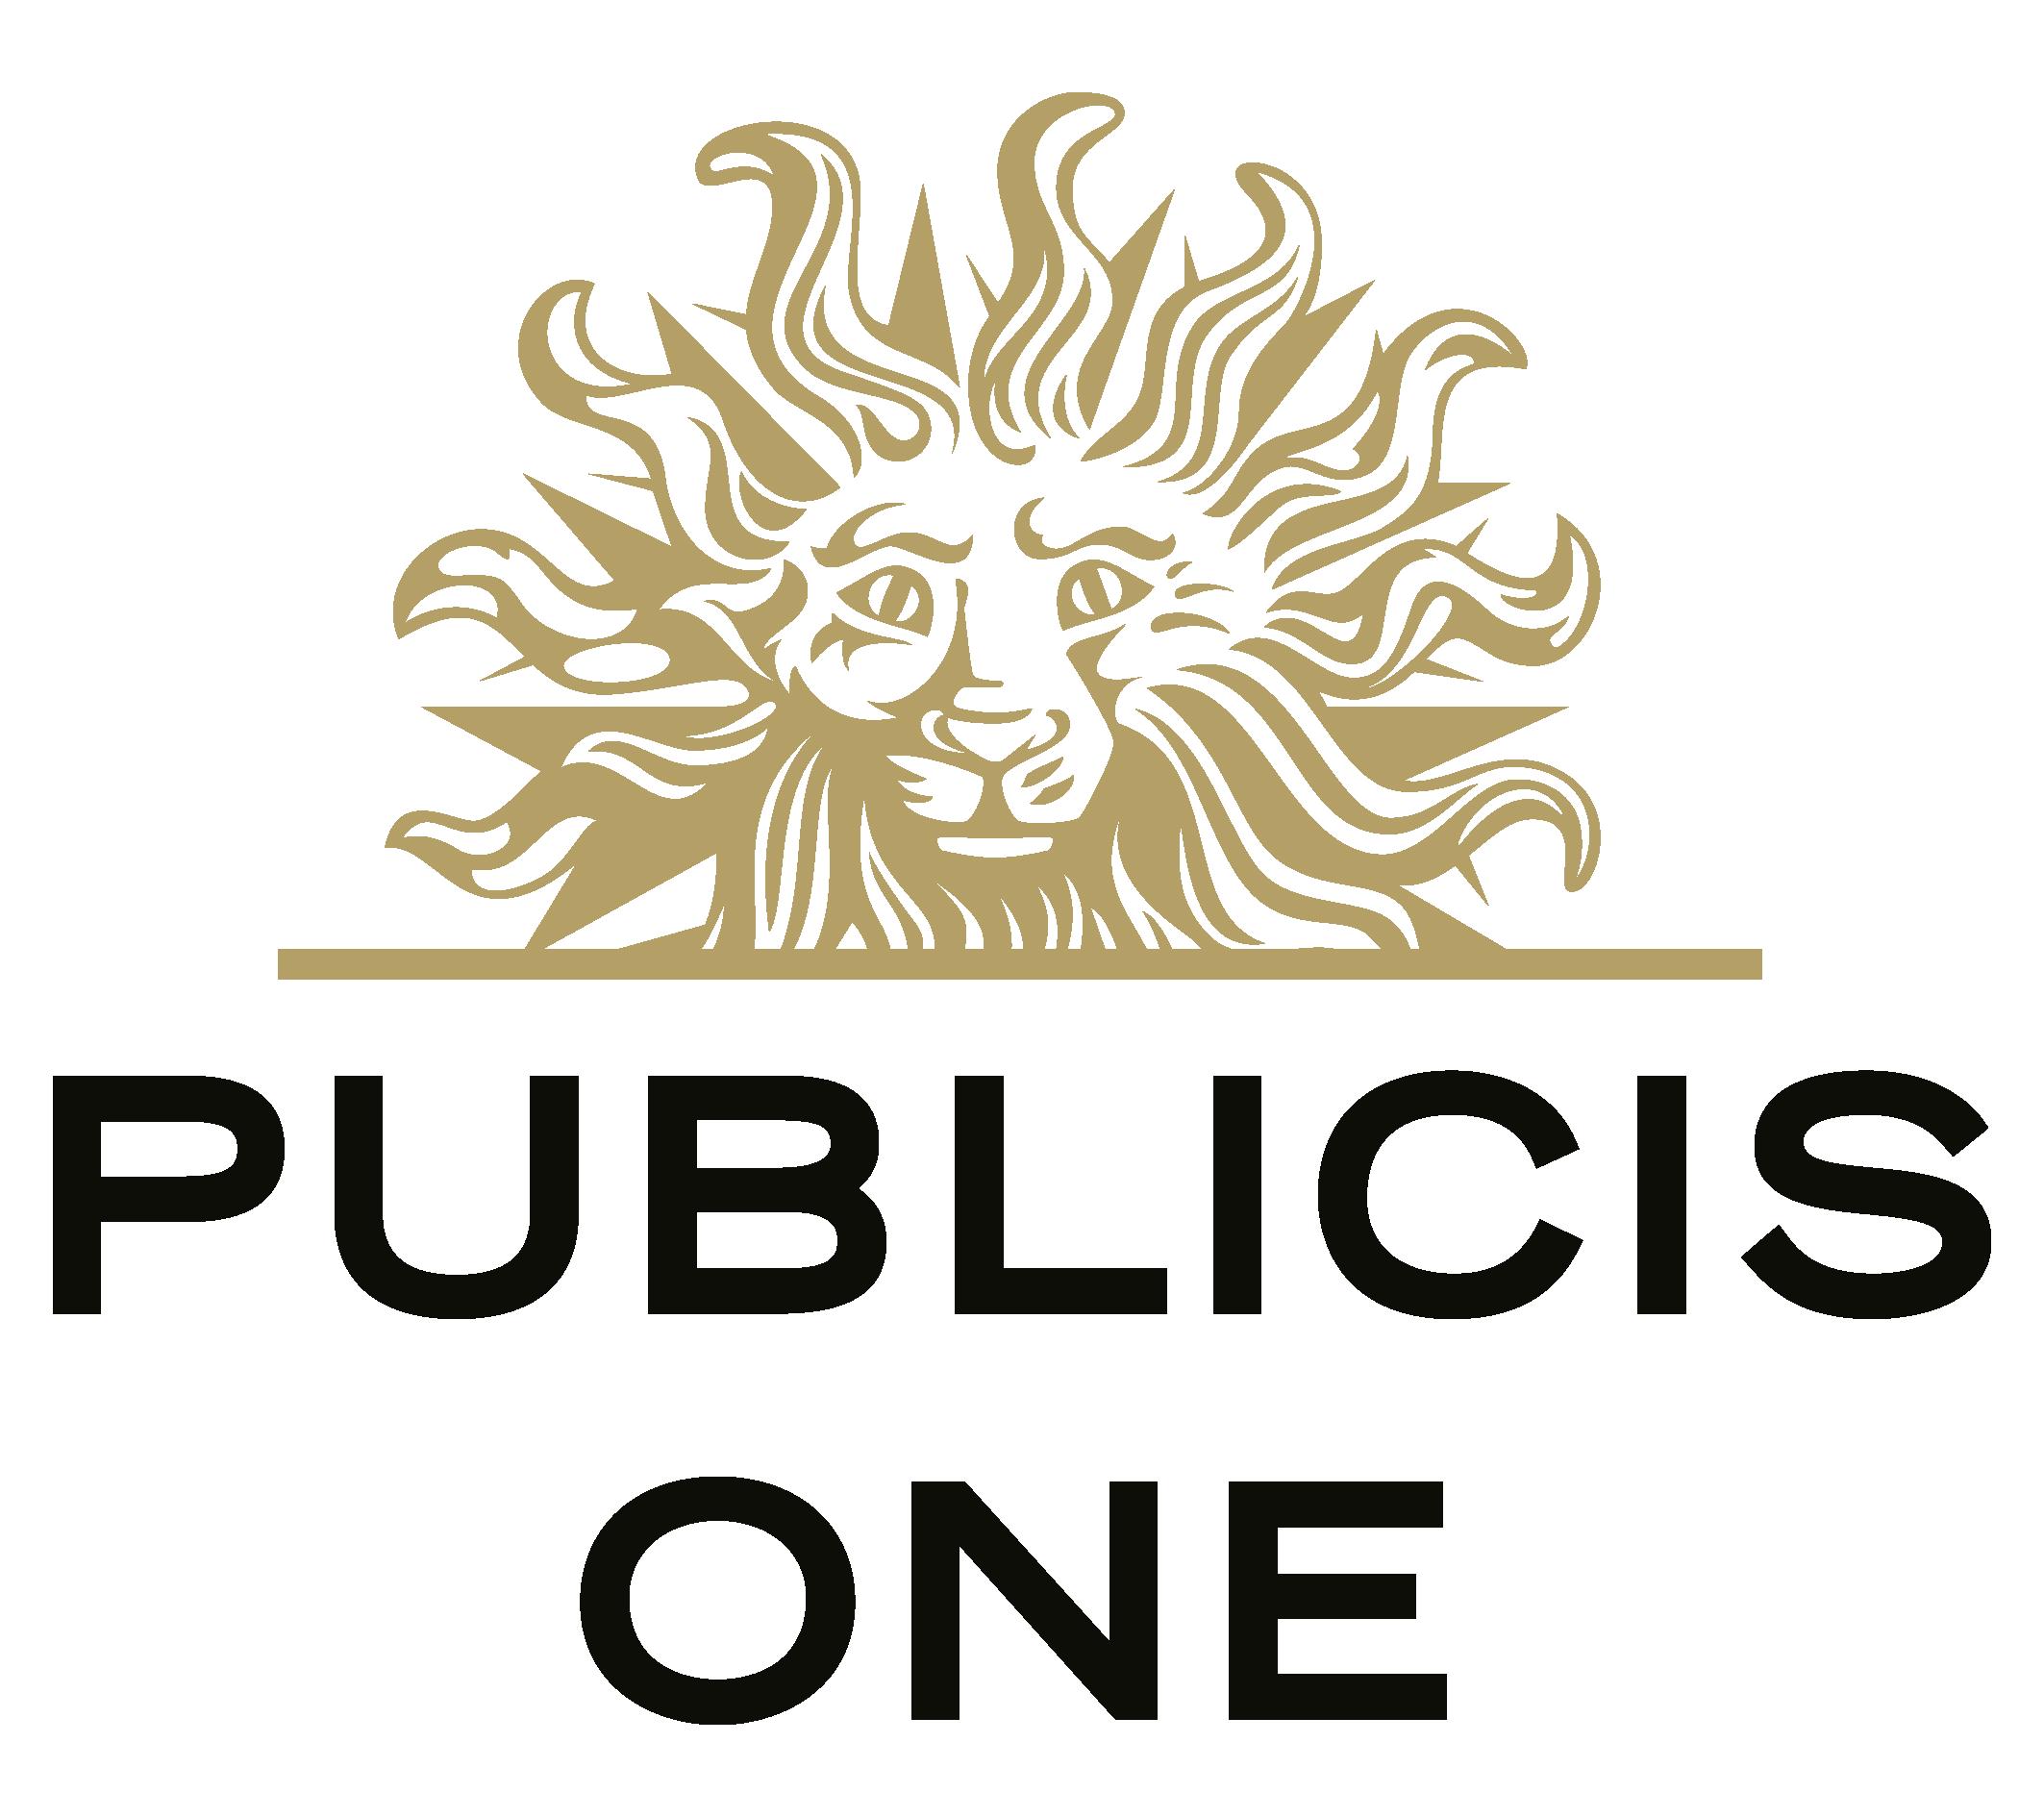 bulevar zorana djindjica 144 11070 belgrade serbia logo vector freepik logo vector free download